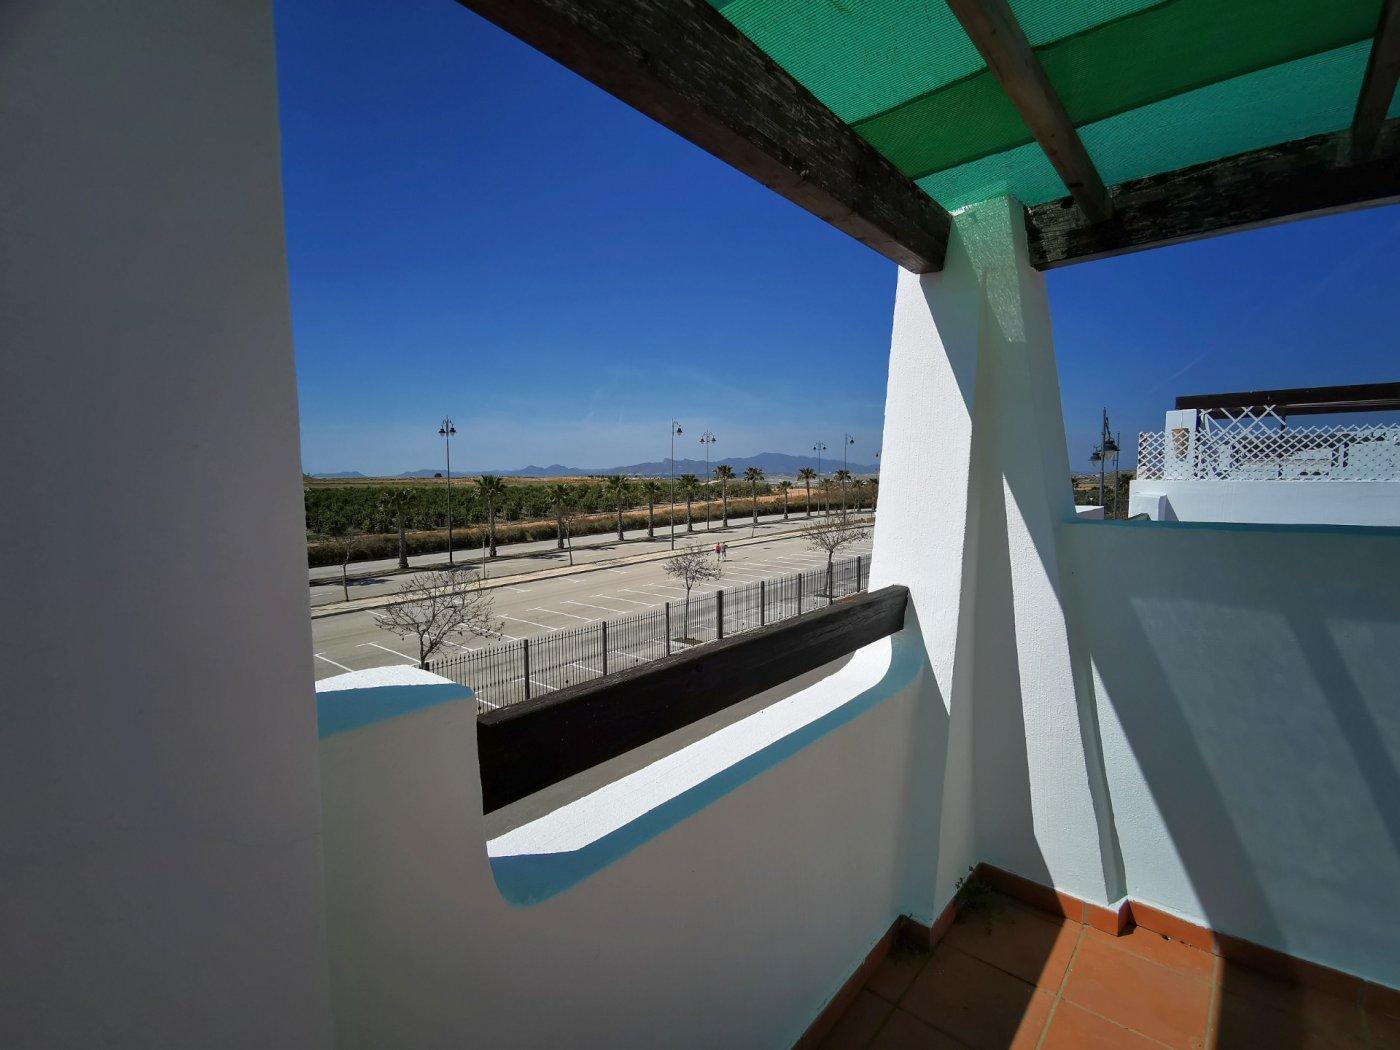 Gallery Image 29 of Key-Ready 2 Bedroom Apartment Overlooking the Citrus Groves in Jardin 10, Condado de Alhama